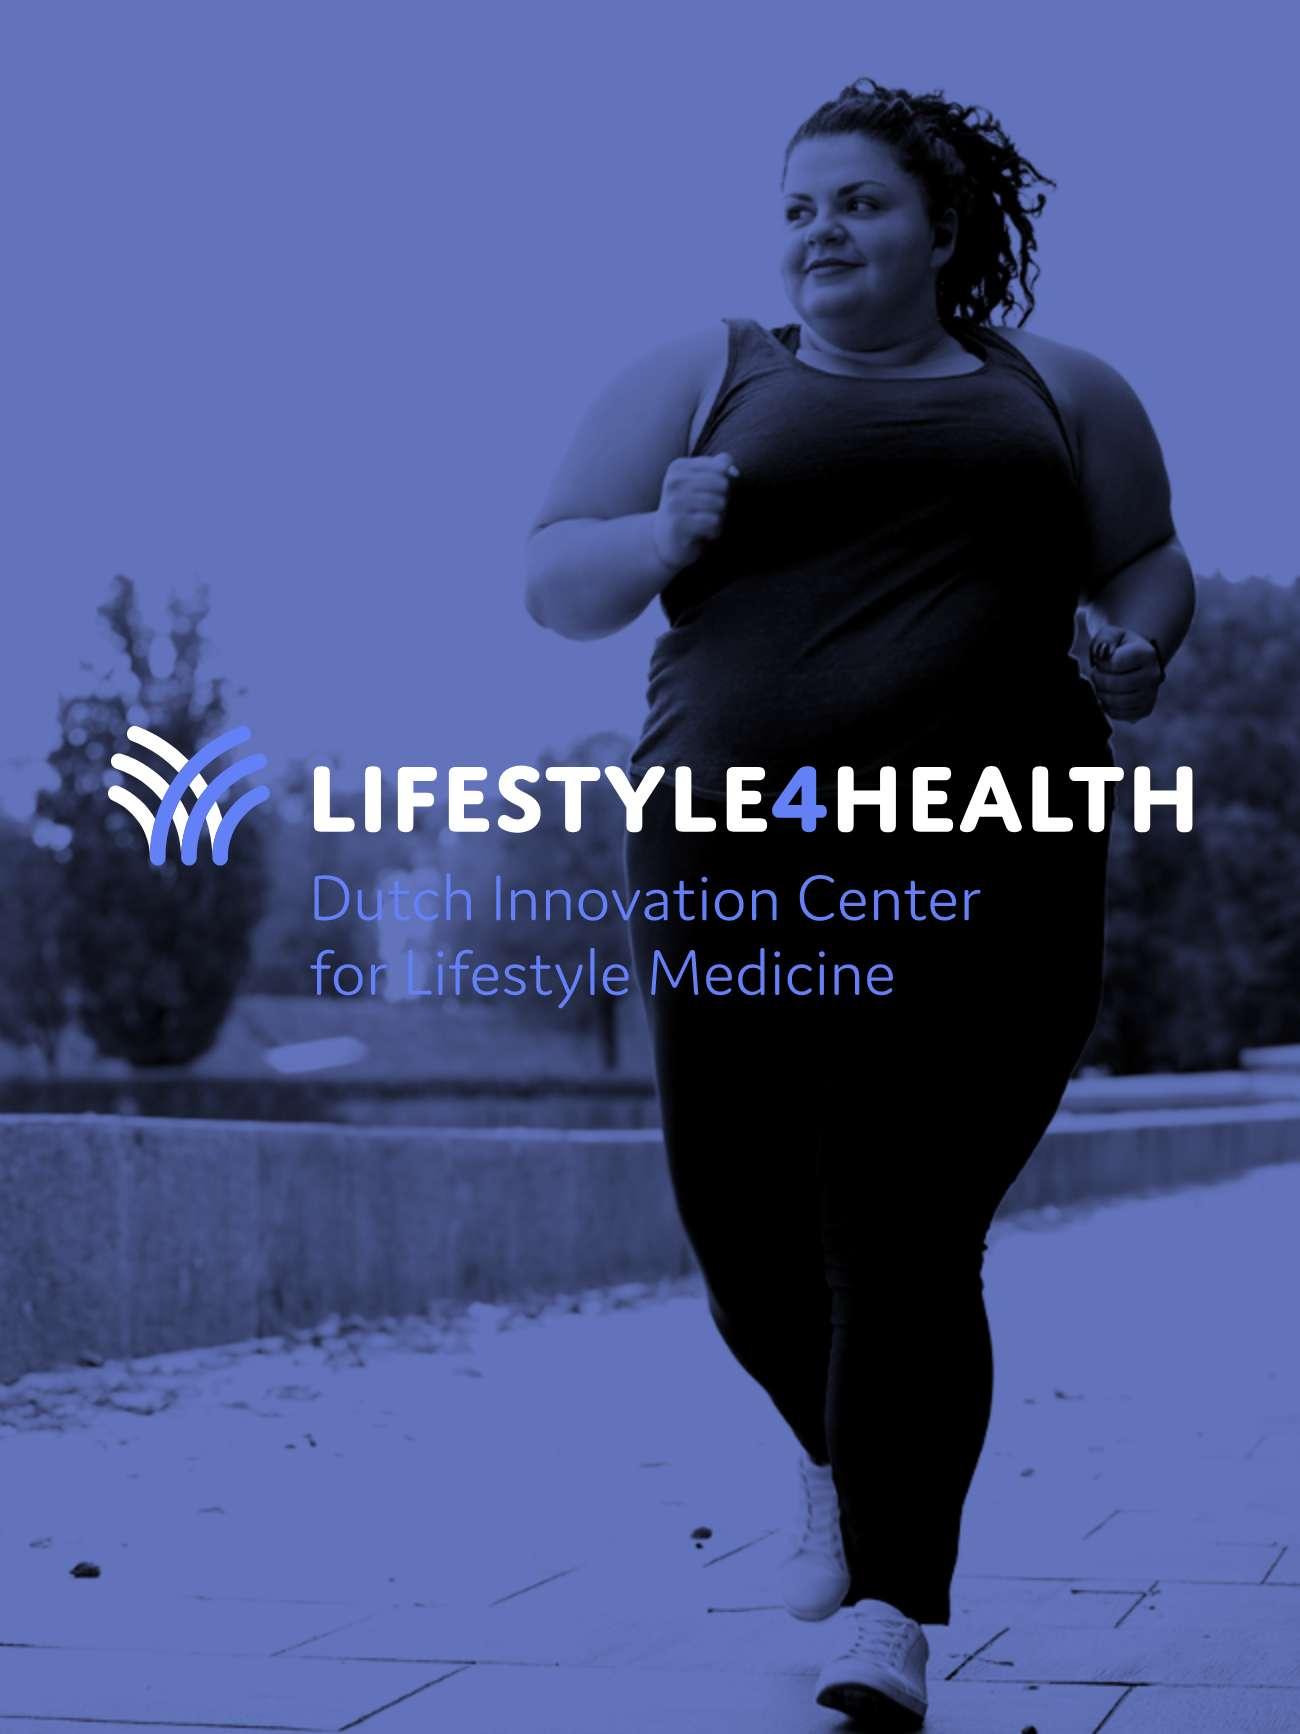 Lifestyle4Health Group